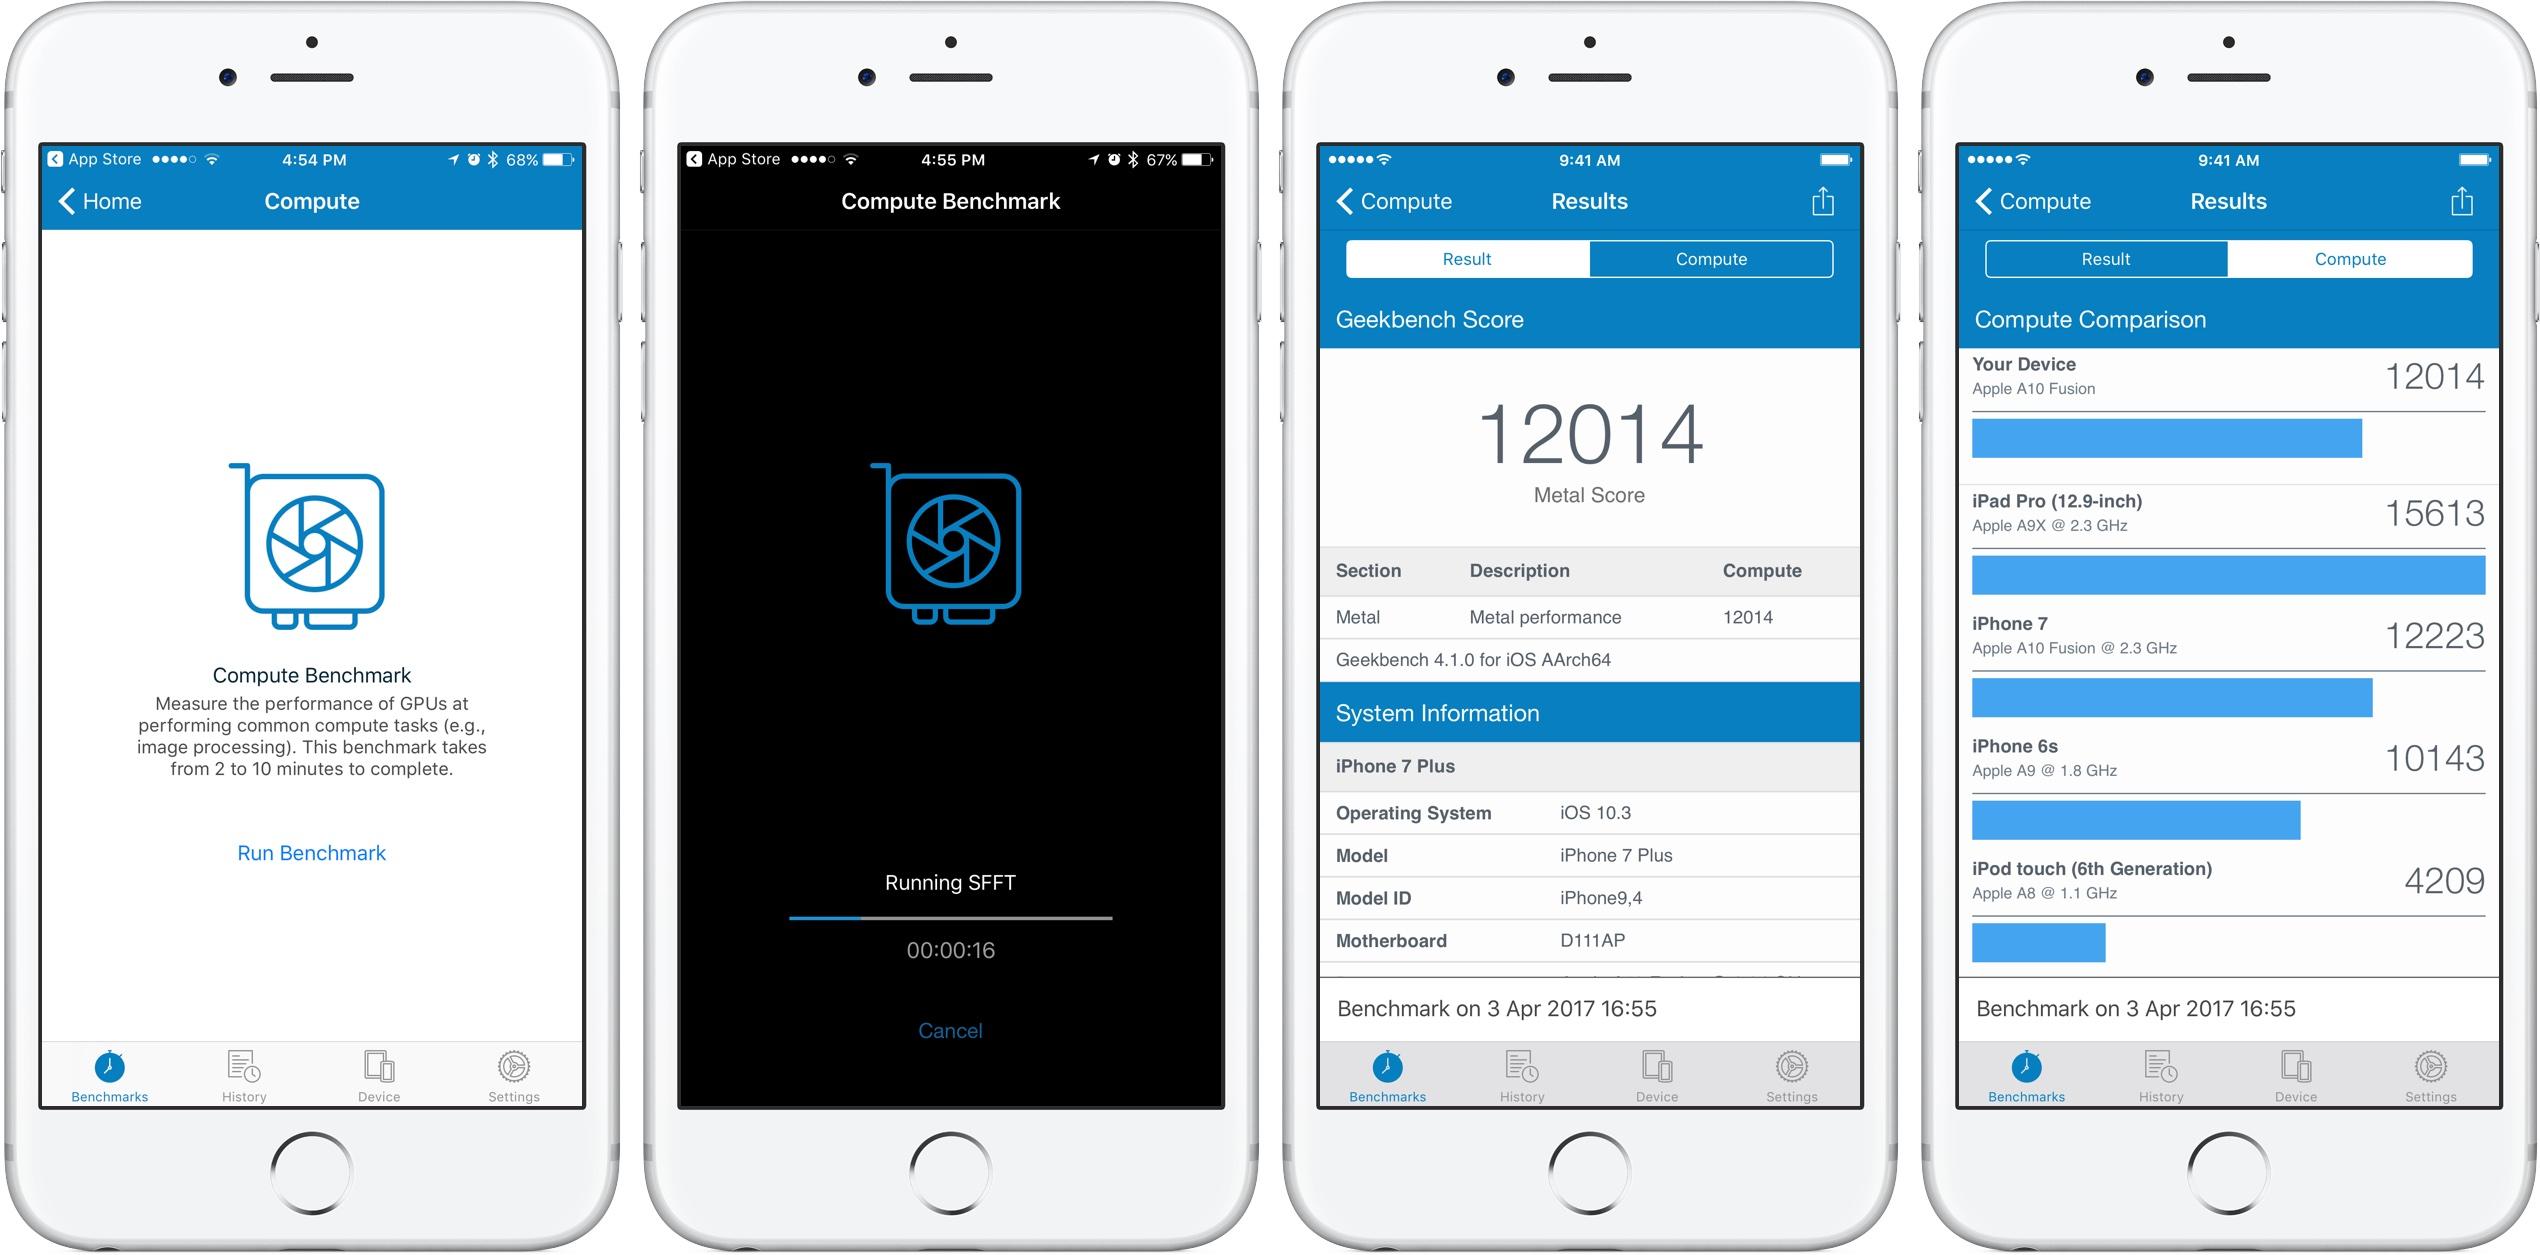 Benchmark GPU performance of your iPhone, iPad and Mac with